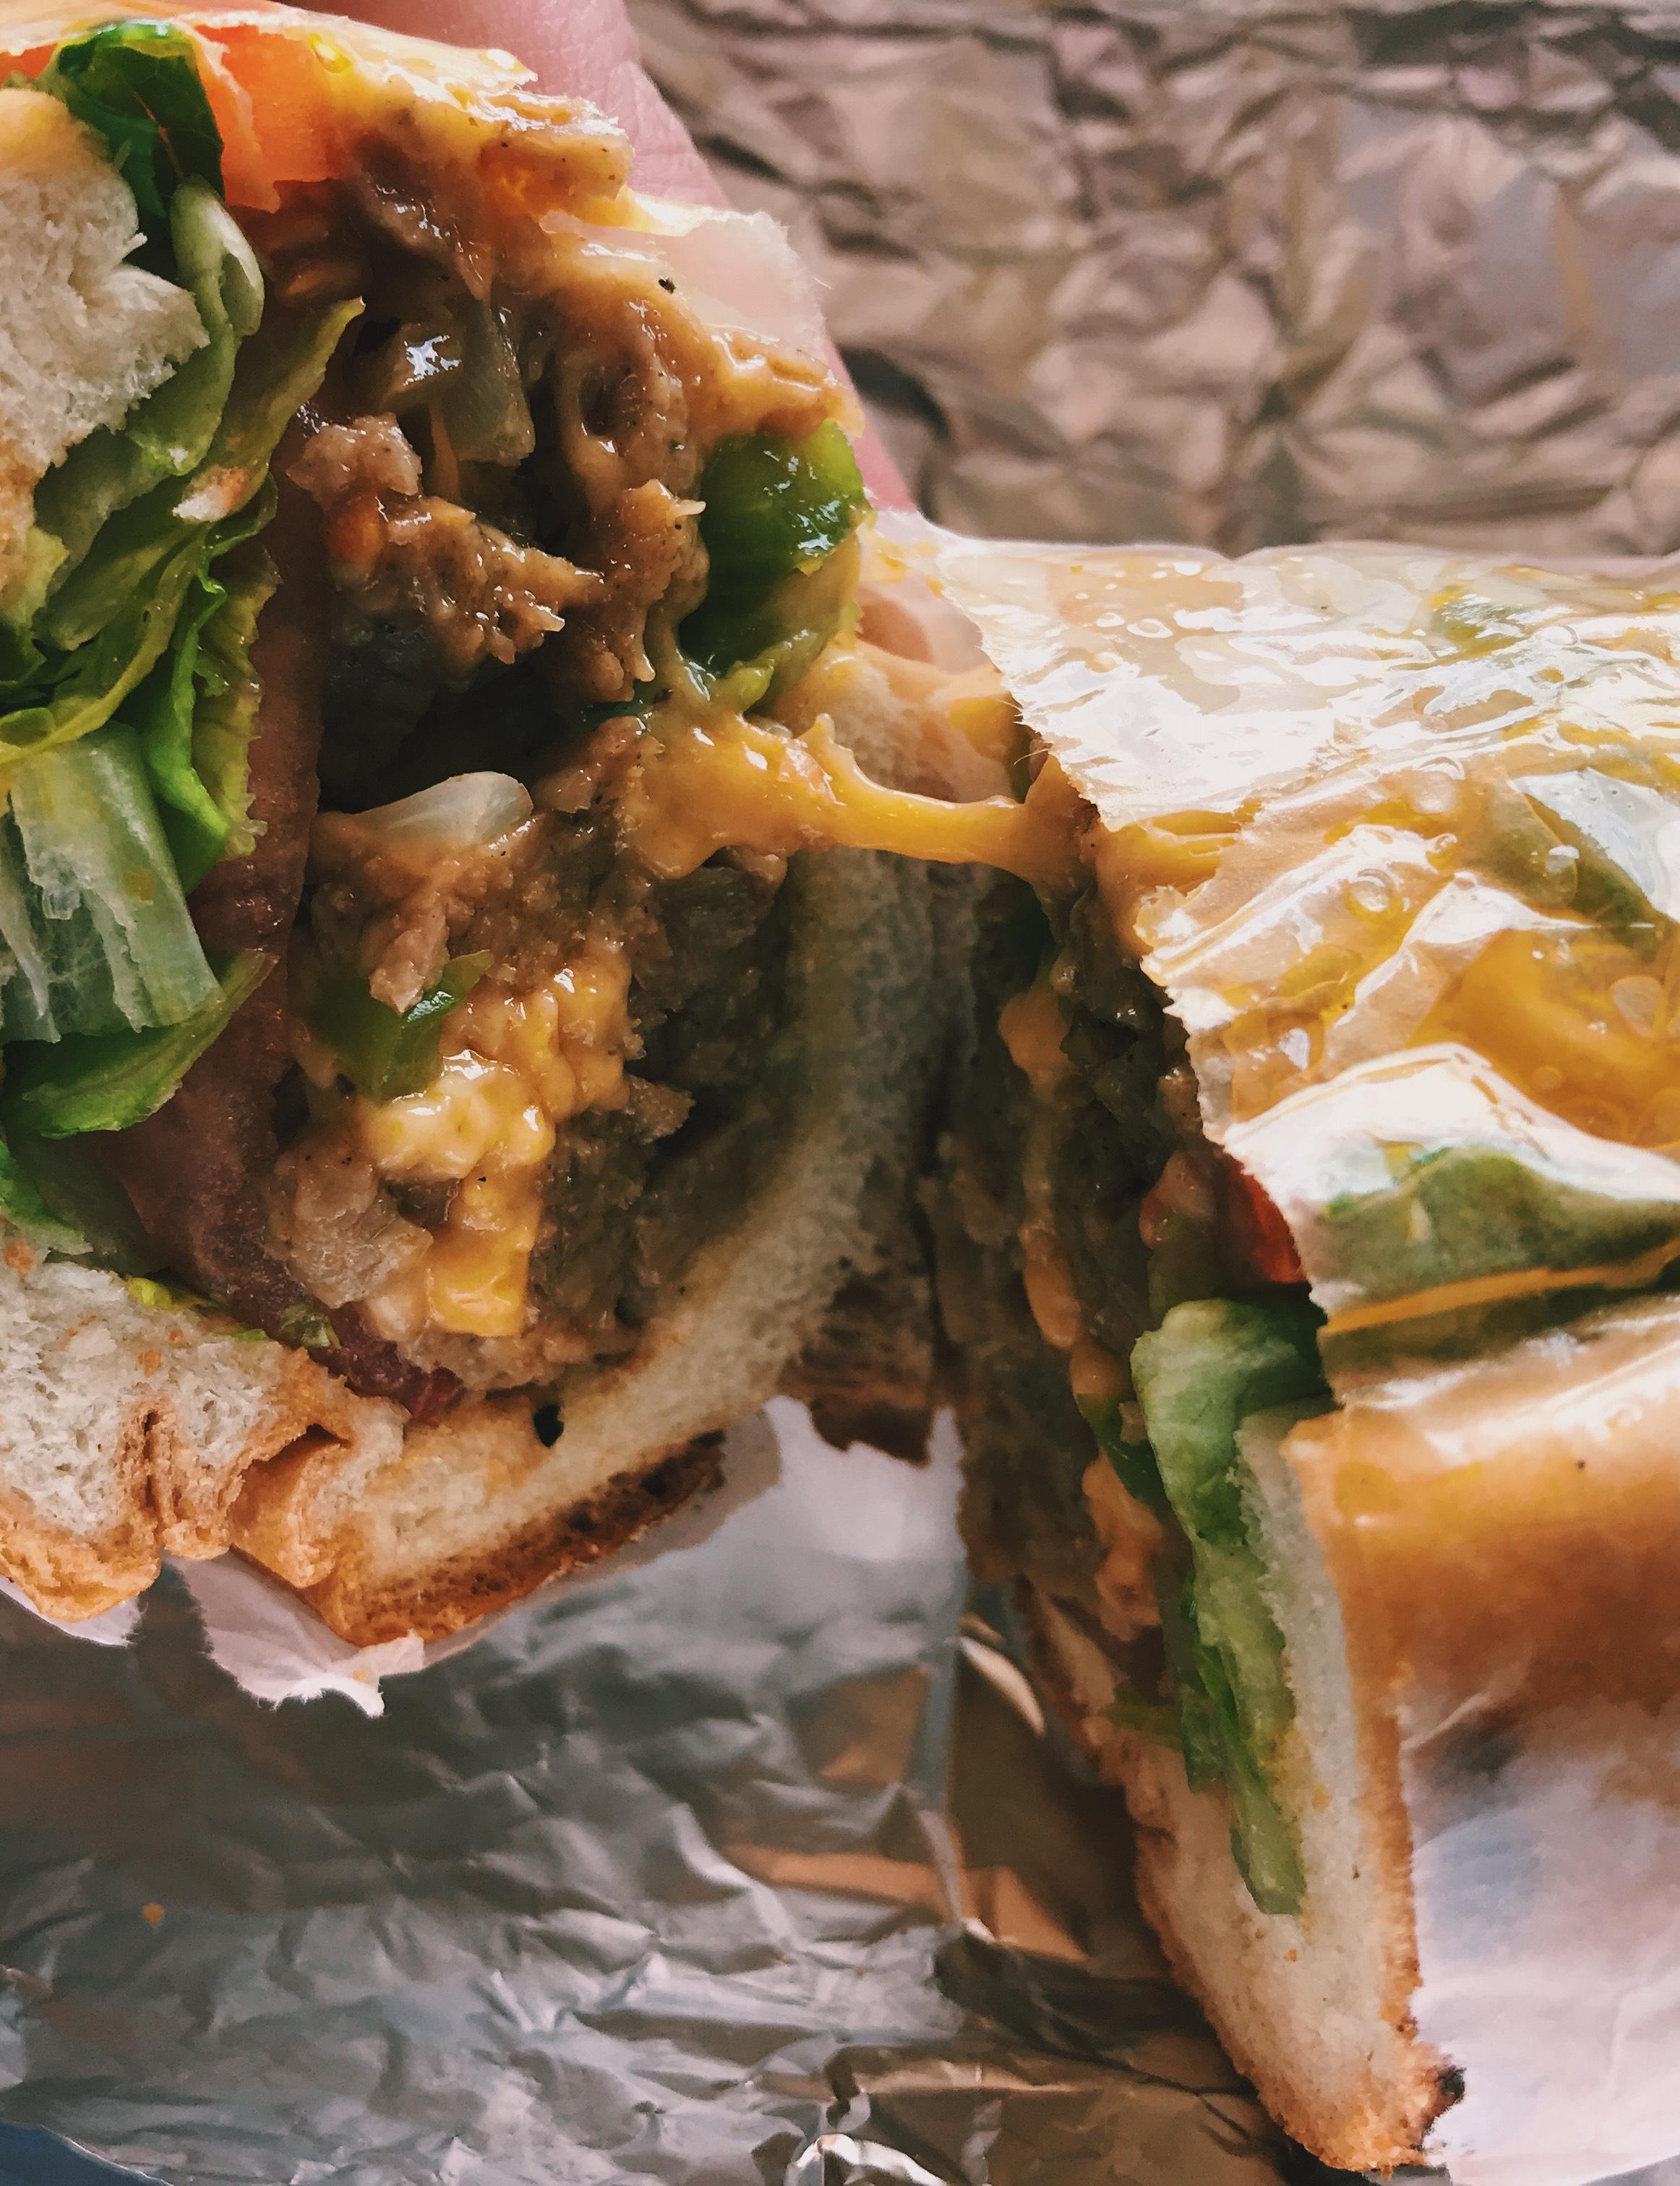 The Bronx Vegan eats: vegan chopped cheese -